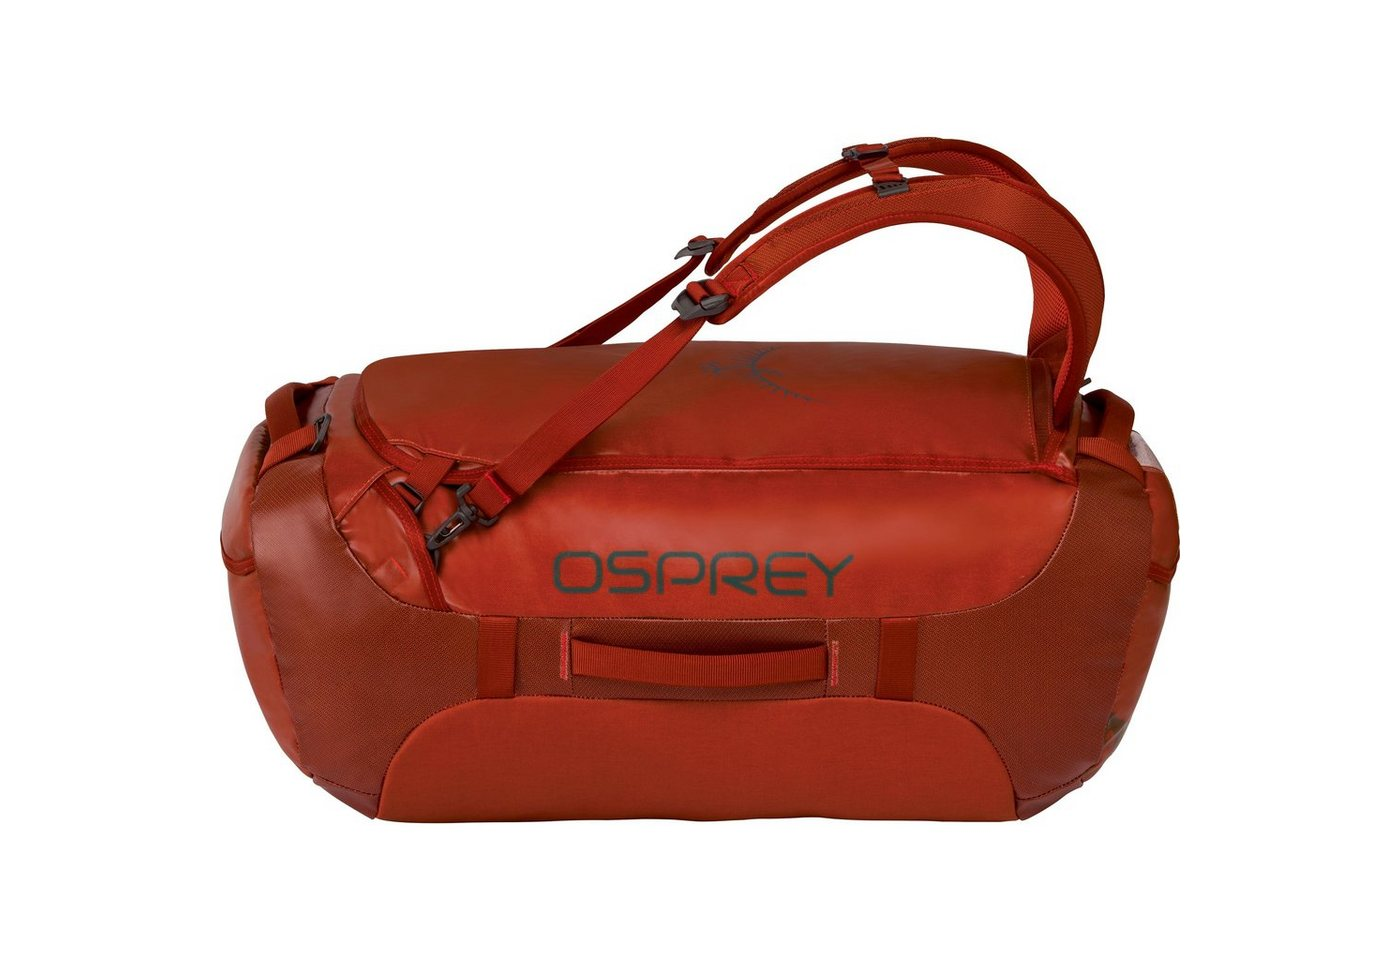 osprey -  Reisetasche »Transporter 65 Duffle«